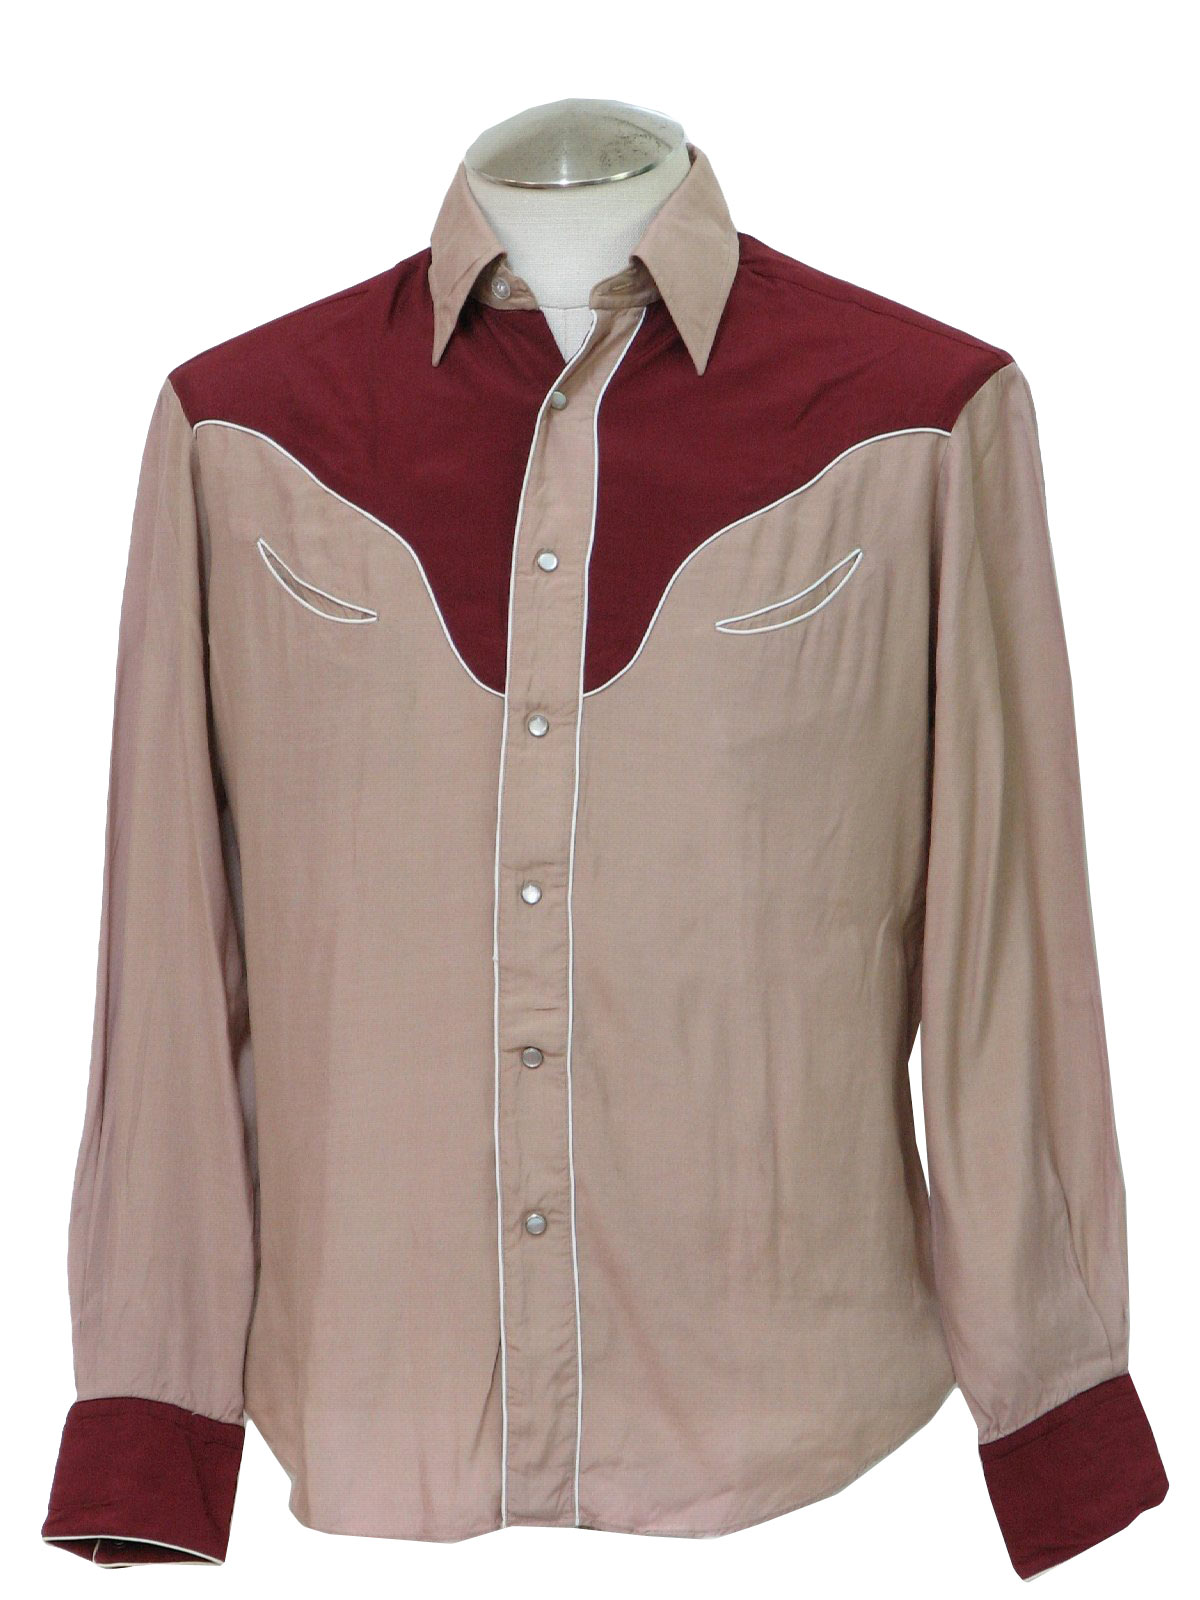 Retro 50s Western Shirt Kennington Style made In